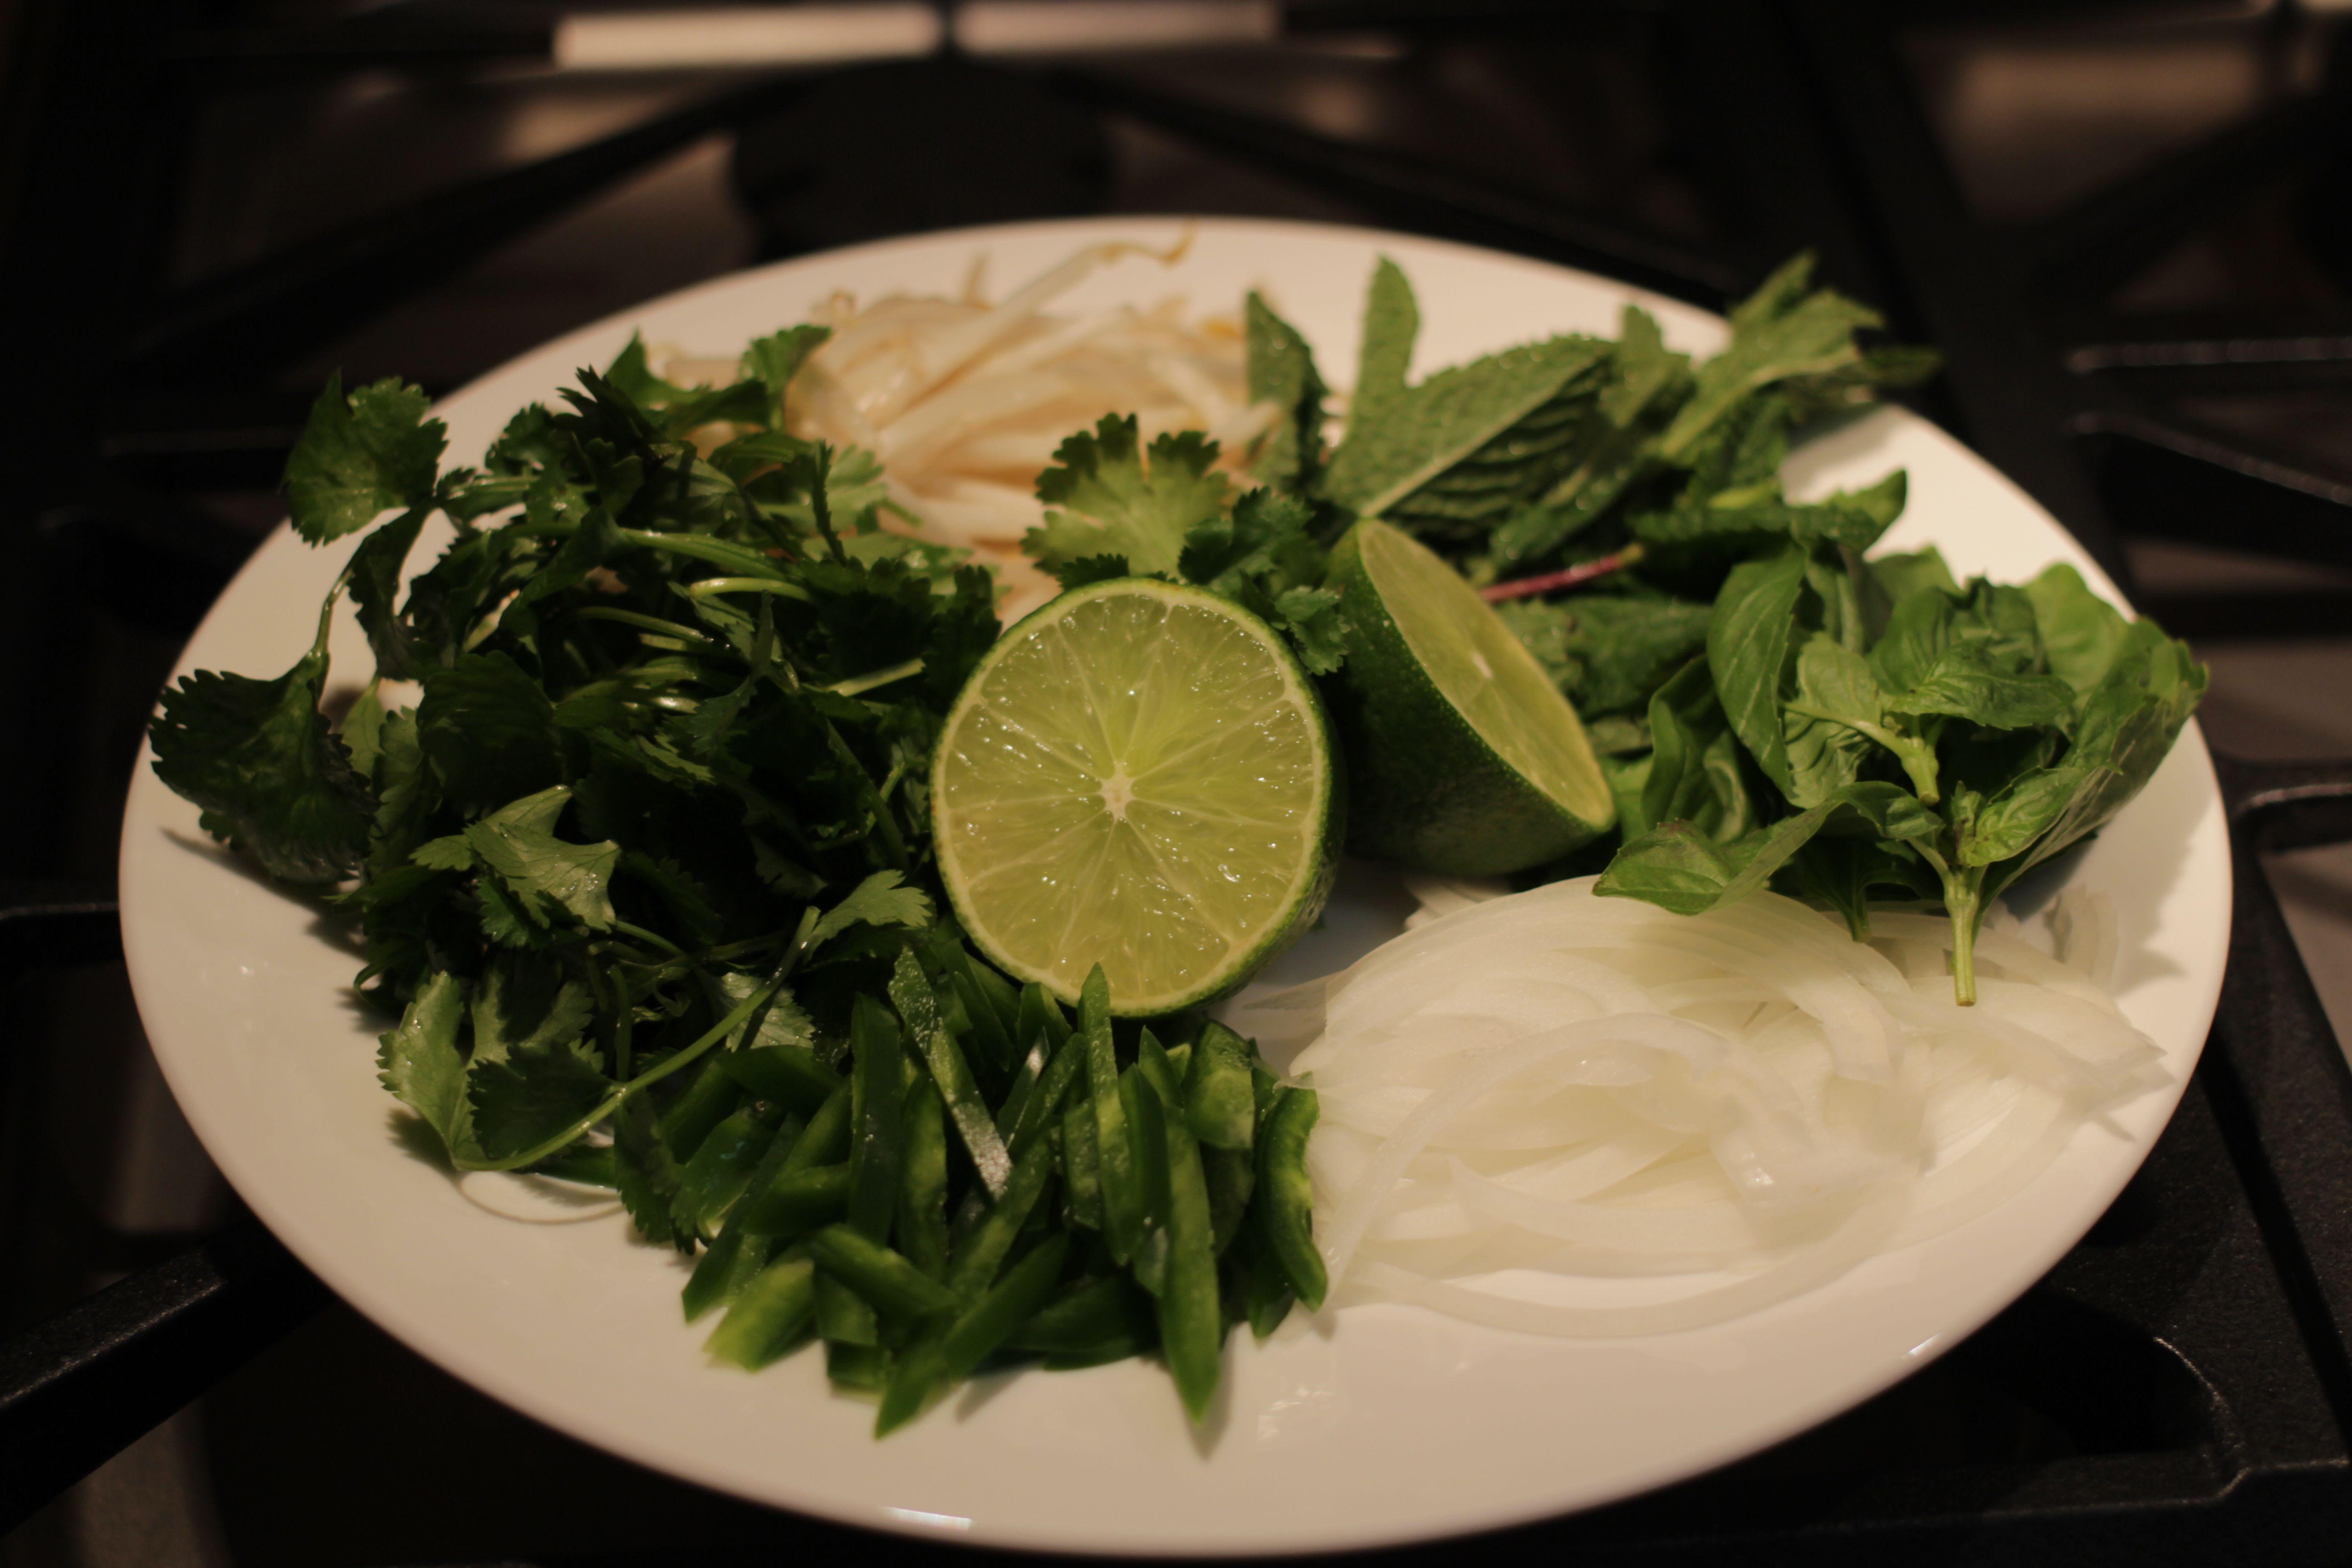 Onion, jalapeño, mint, basil and mung beans